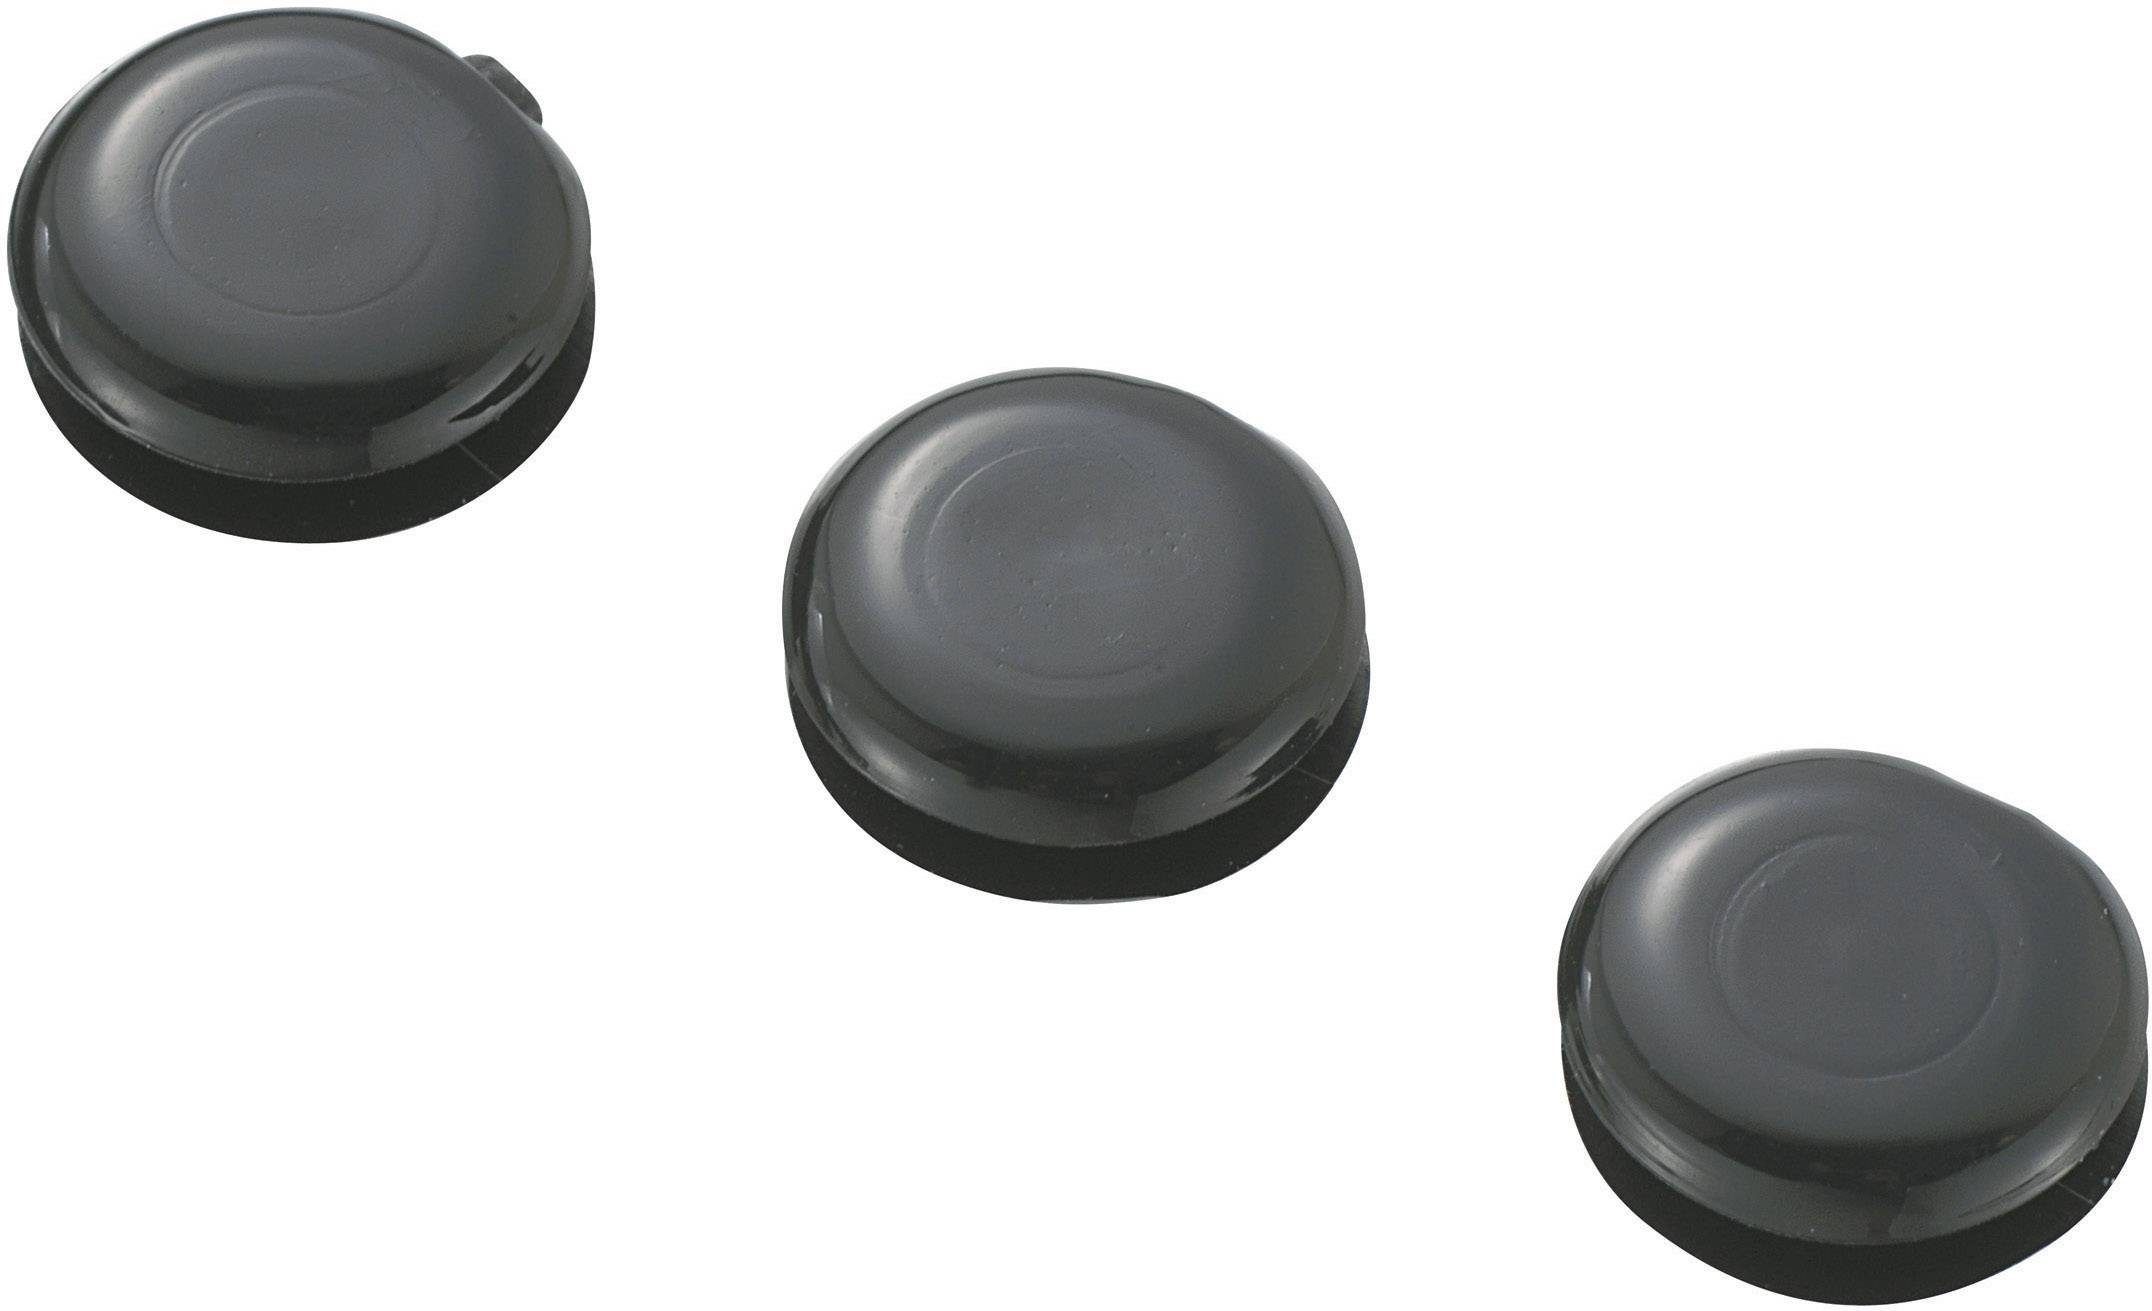 Káblová priechodka KSS GMCQR-0705, Ø 5 mm, PVC, čierna, 1 ks